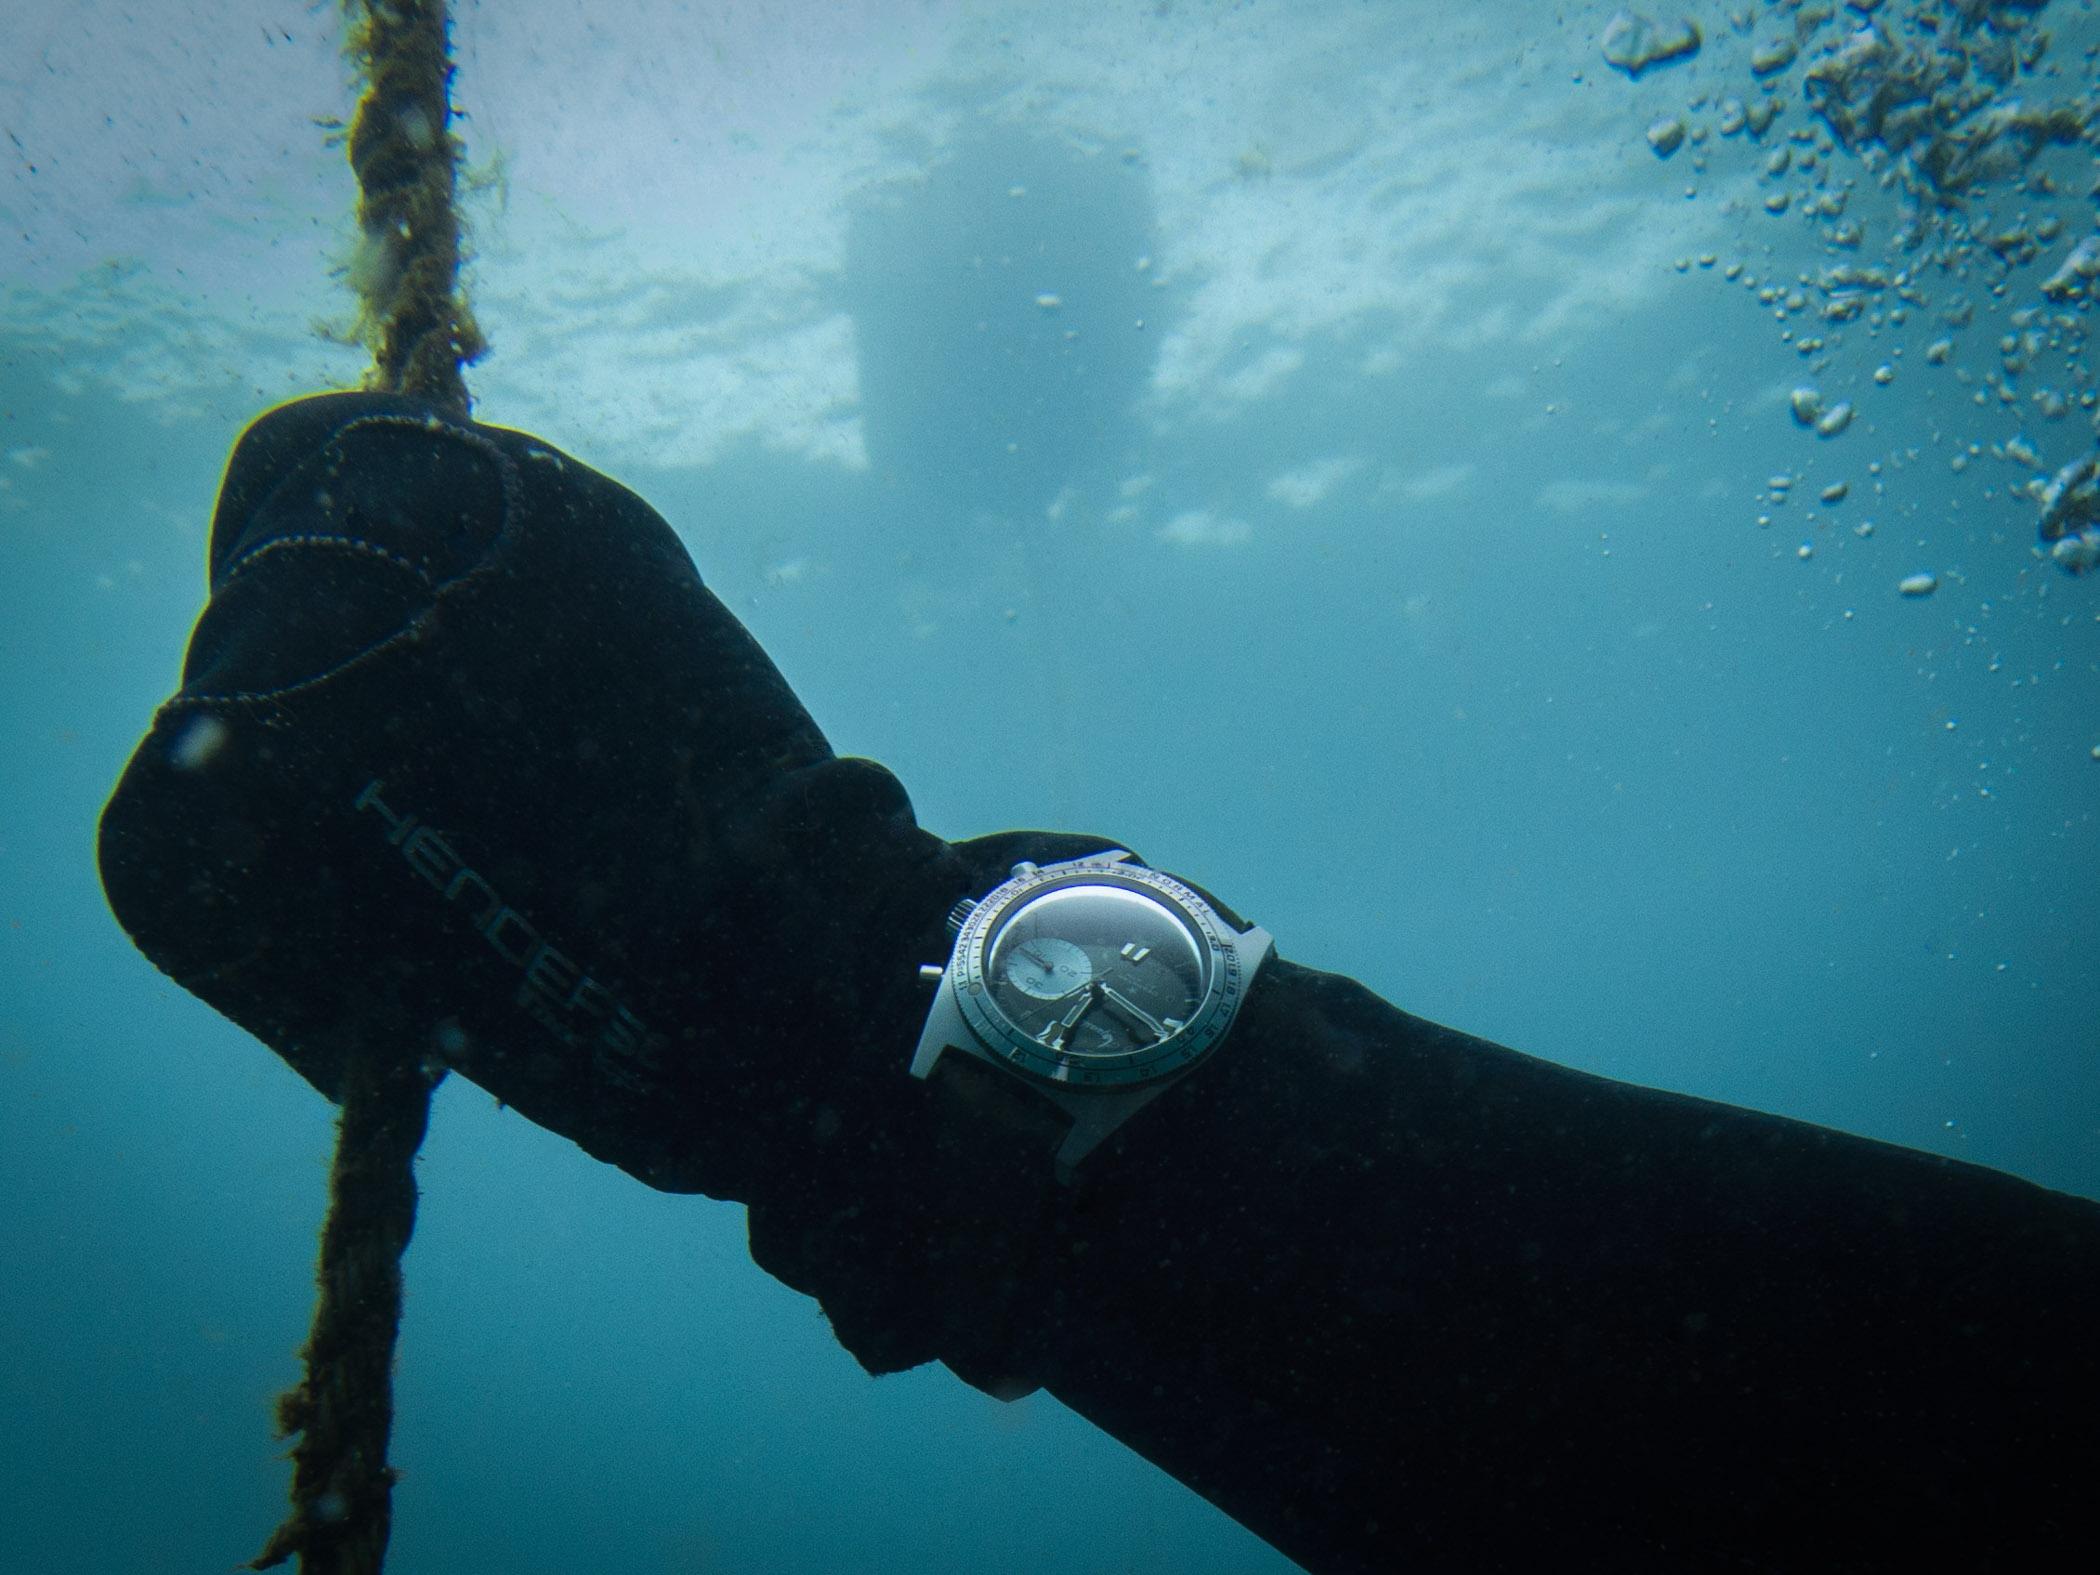 Aquastar Deepstar Greenwich Diving Chronograph